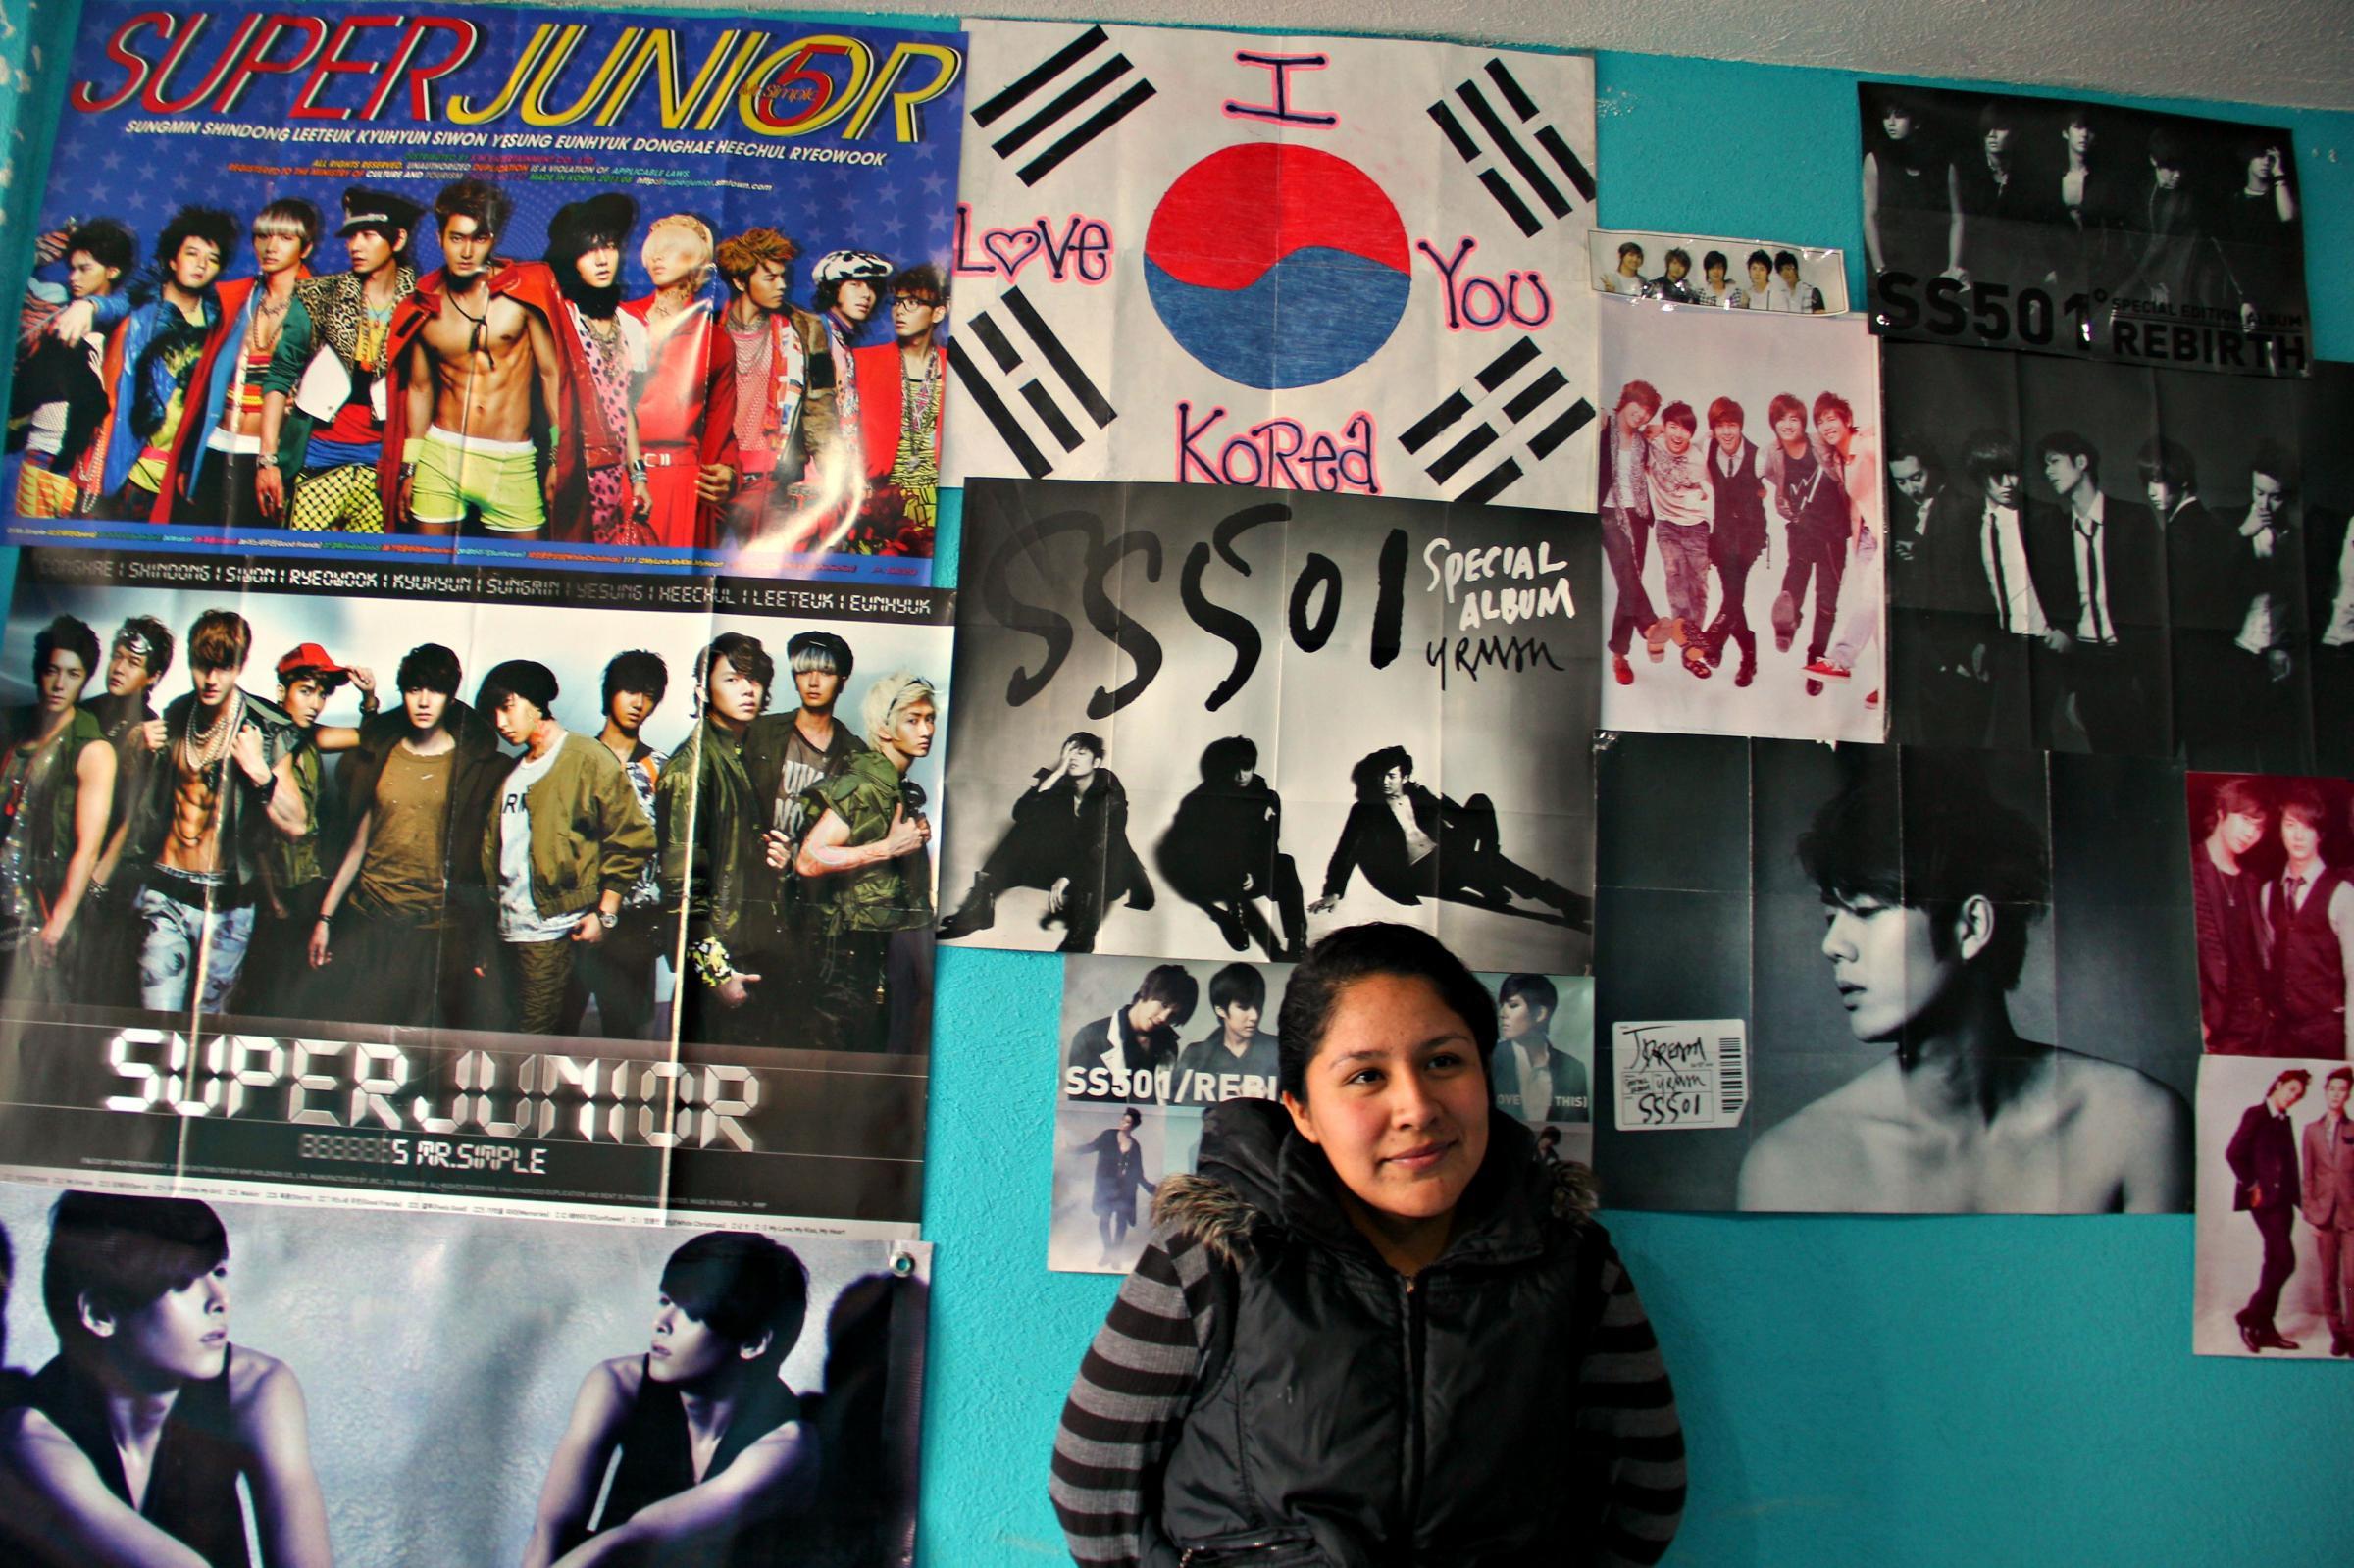 image Korean boy in america amwf